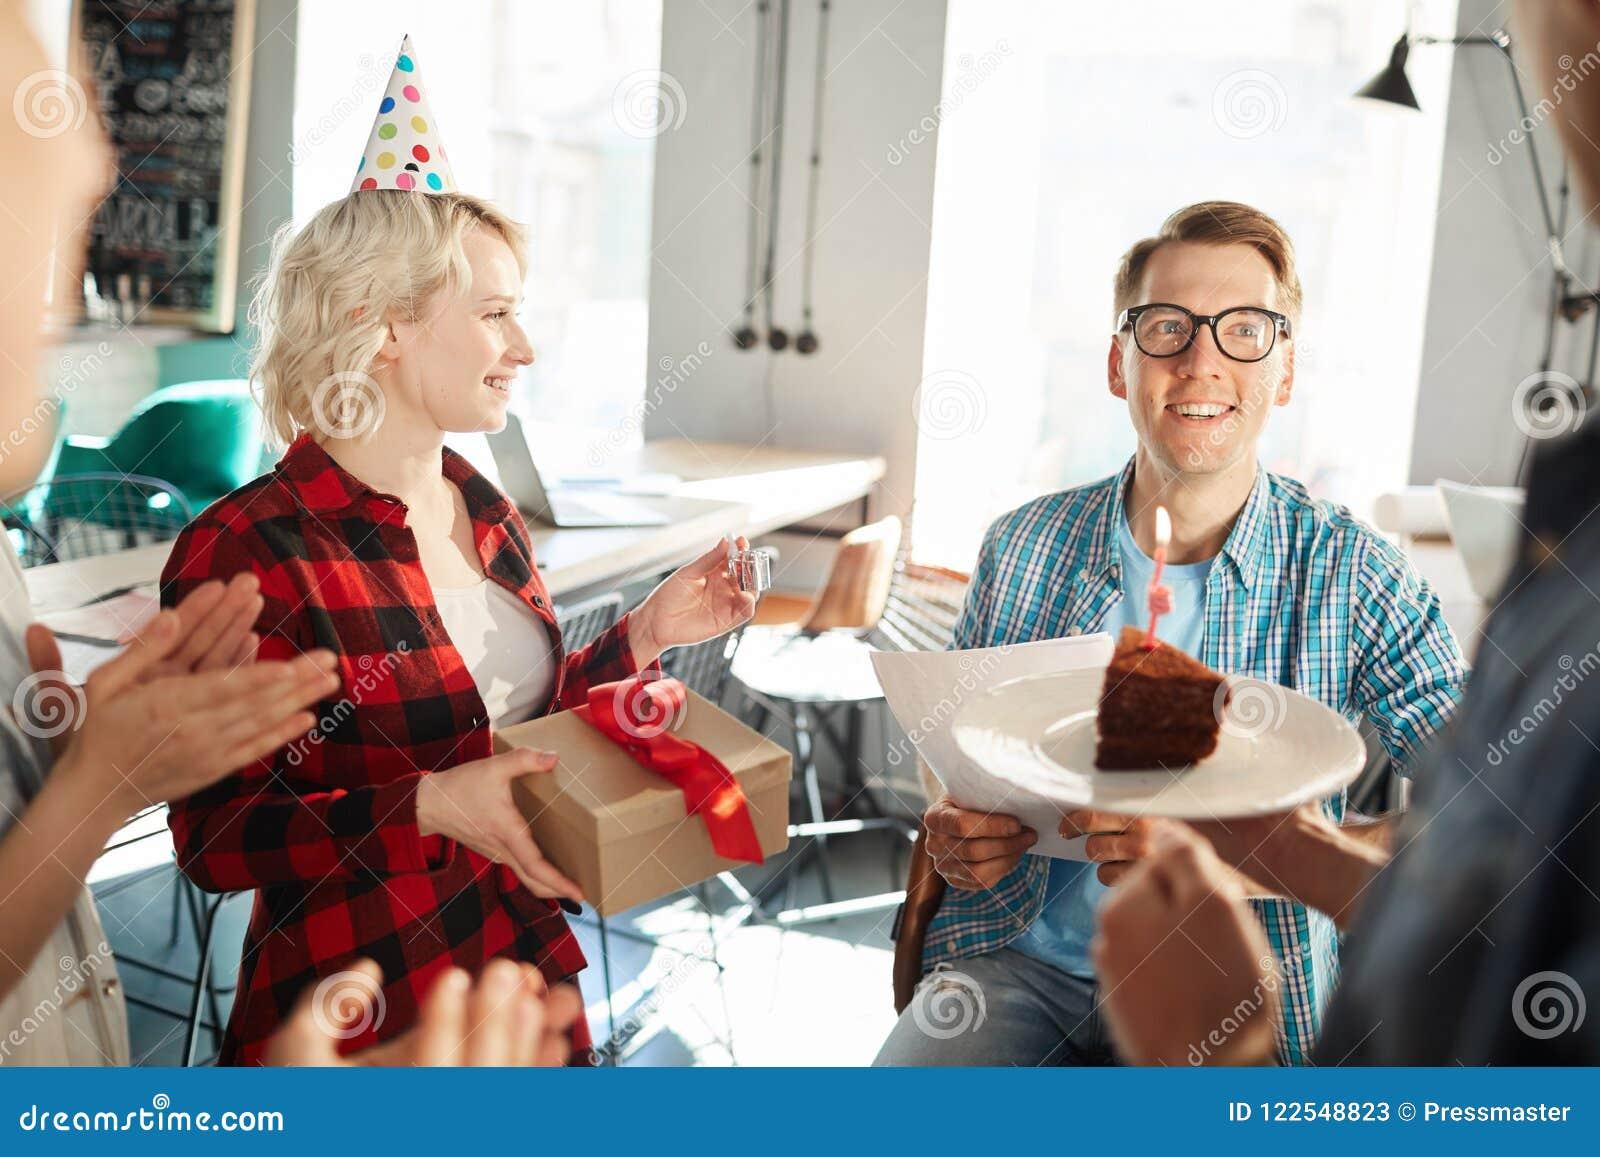 Birthday Cake In Office Stock Image Image Of Joyful 122548823